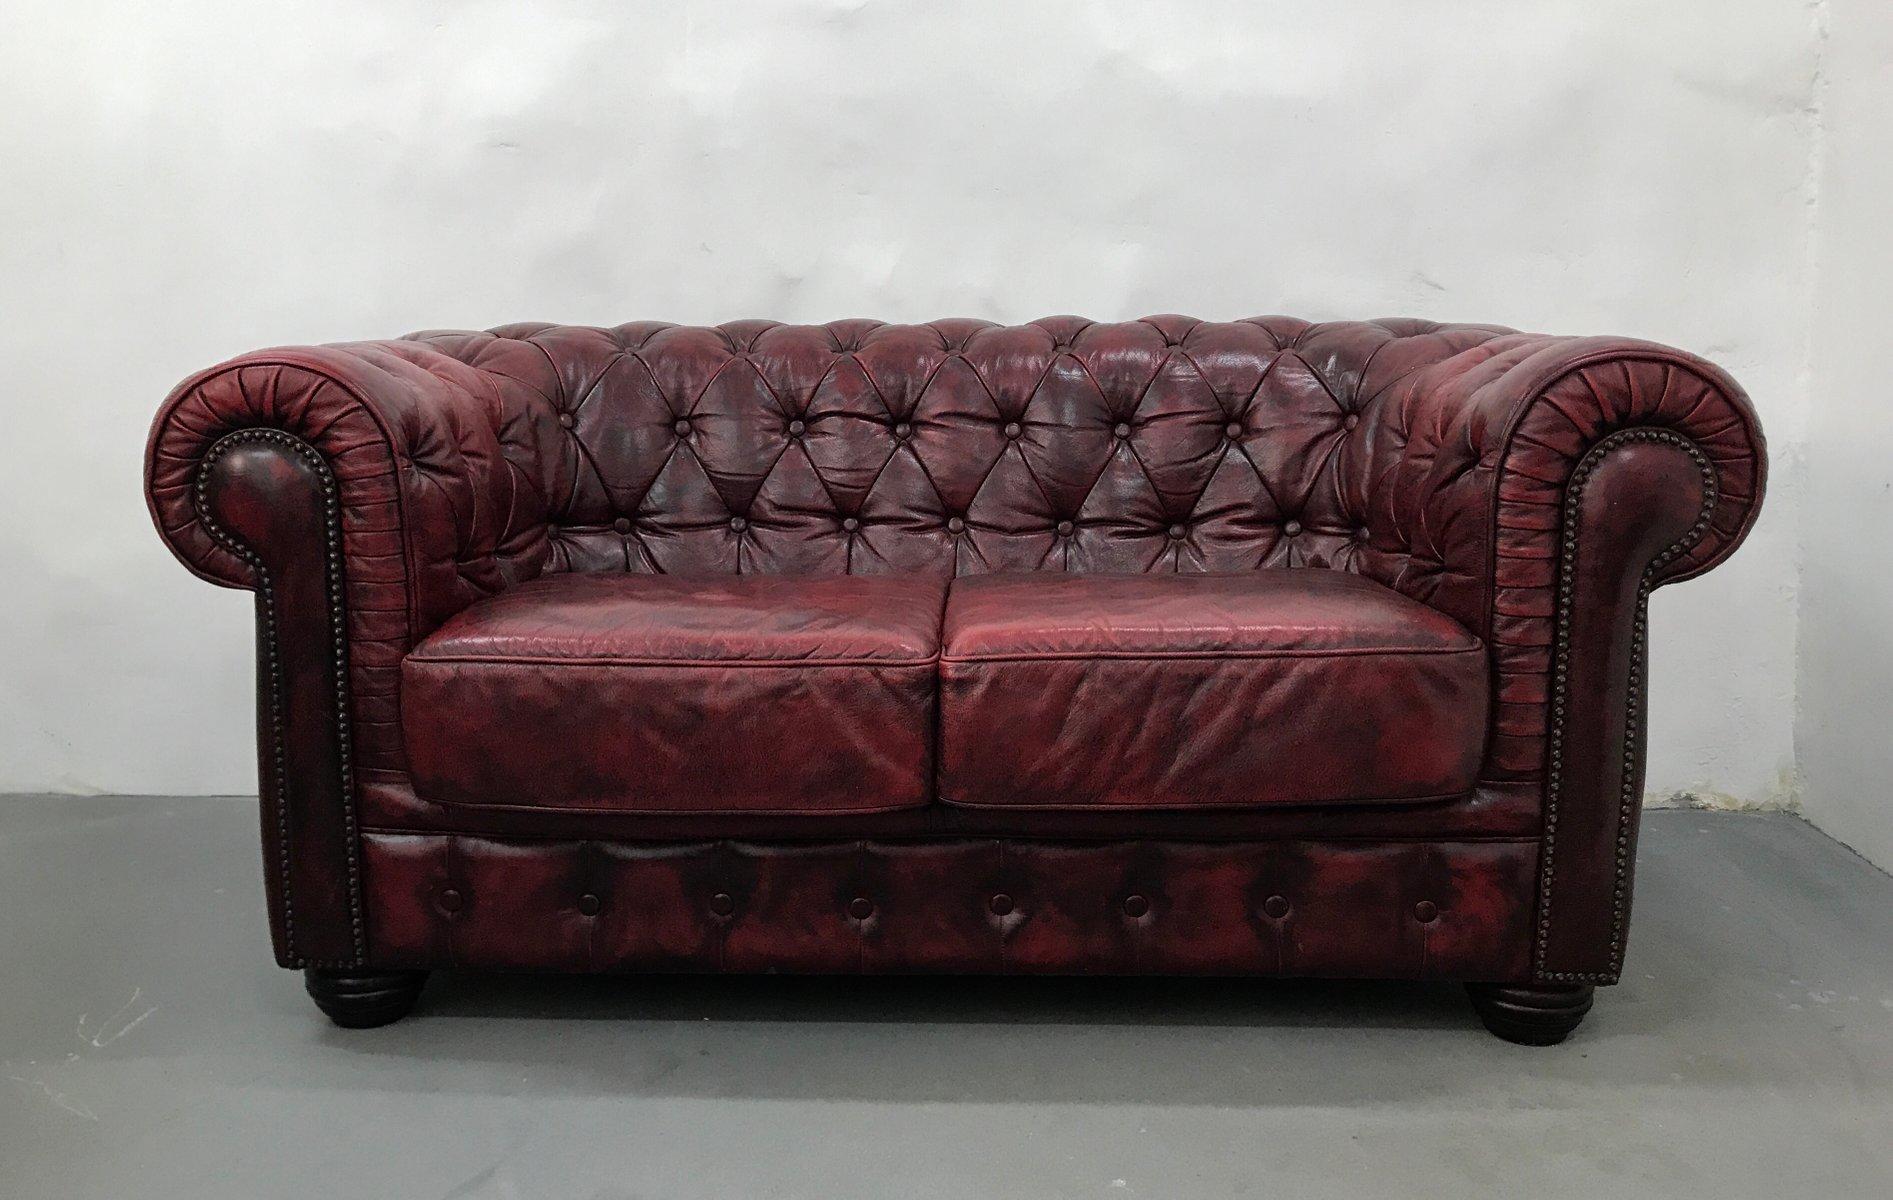 Terrific Vintage Oxblood Leather 2 Seater Chesterfield Sofa From Rubelli Inzonedesignstudio Interior Chair Design Inzonedesignstudiocom